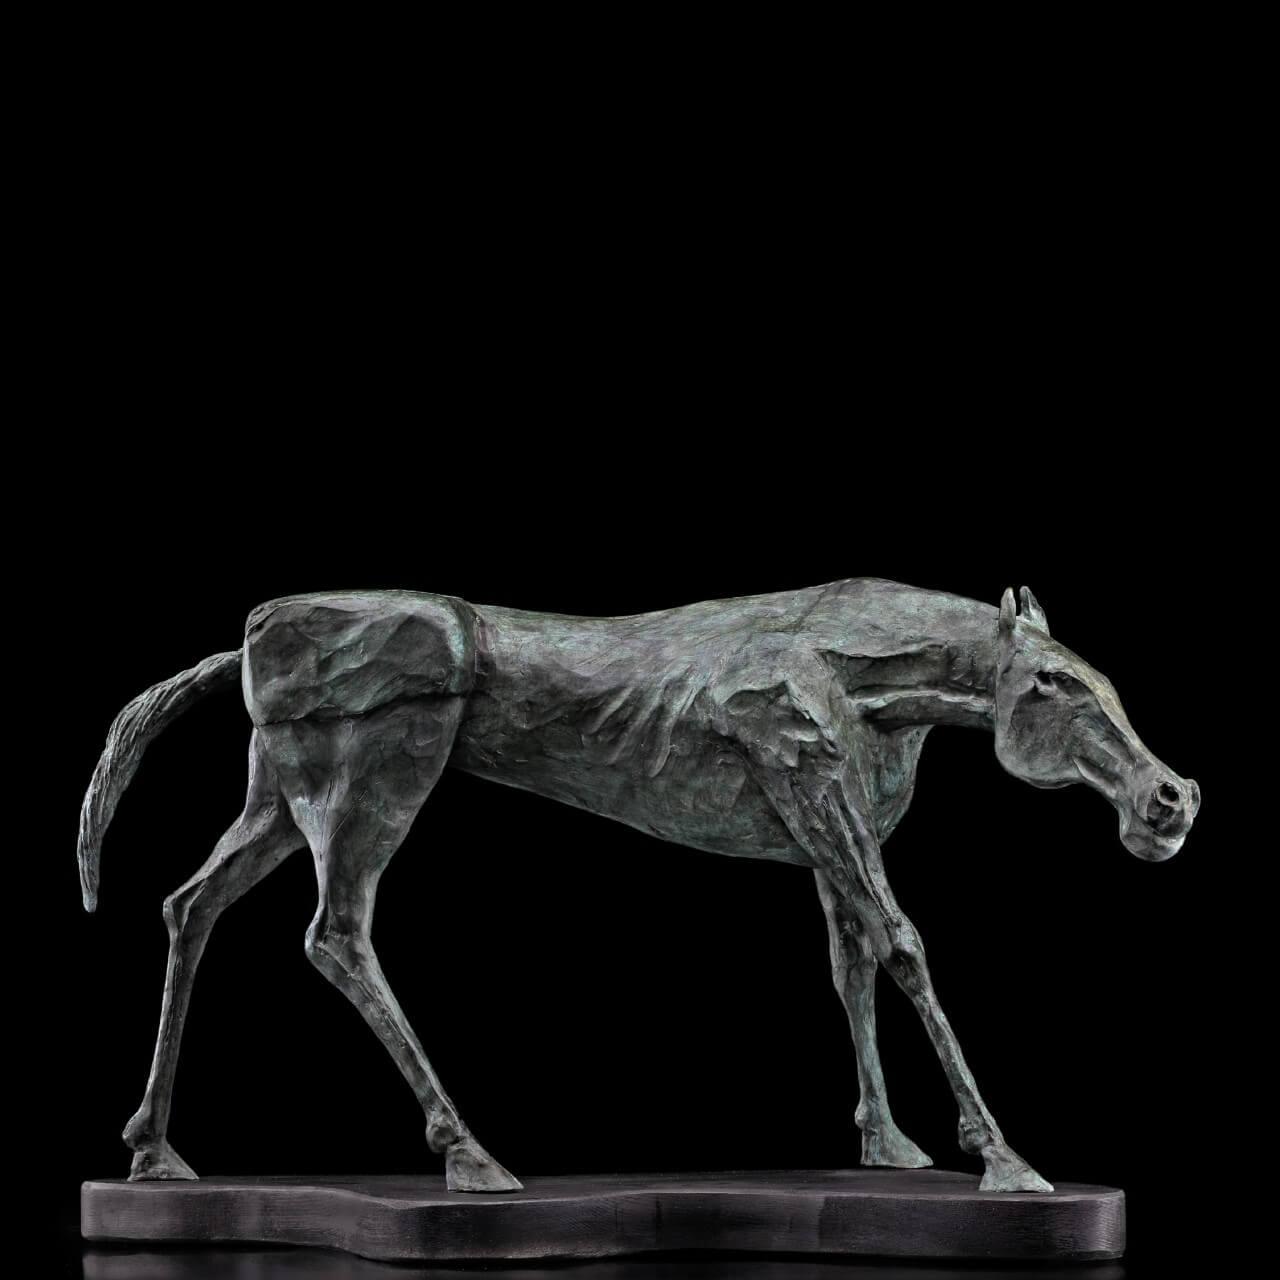 scultura bronzo Mario Pavesi artista reggiano arte animali cavallo puledro